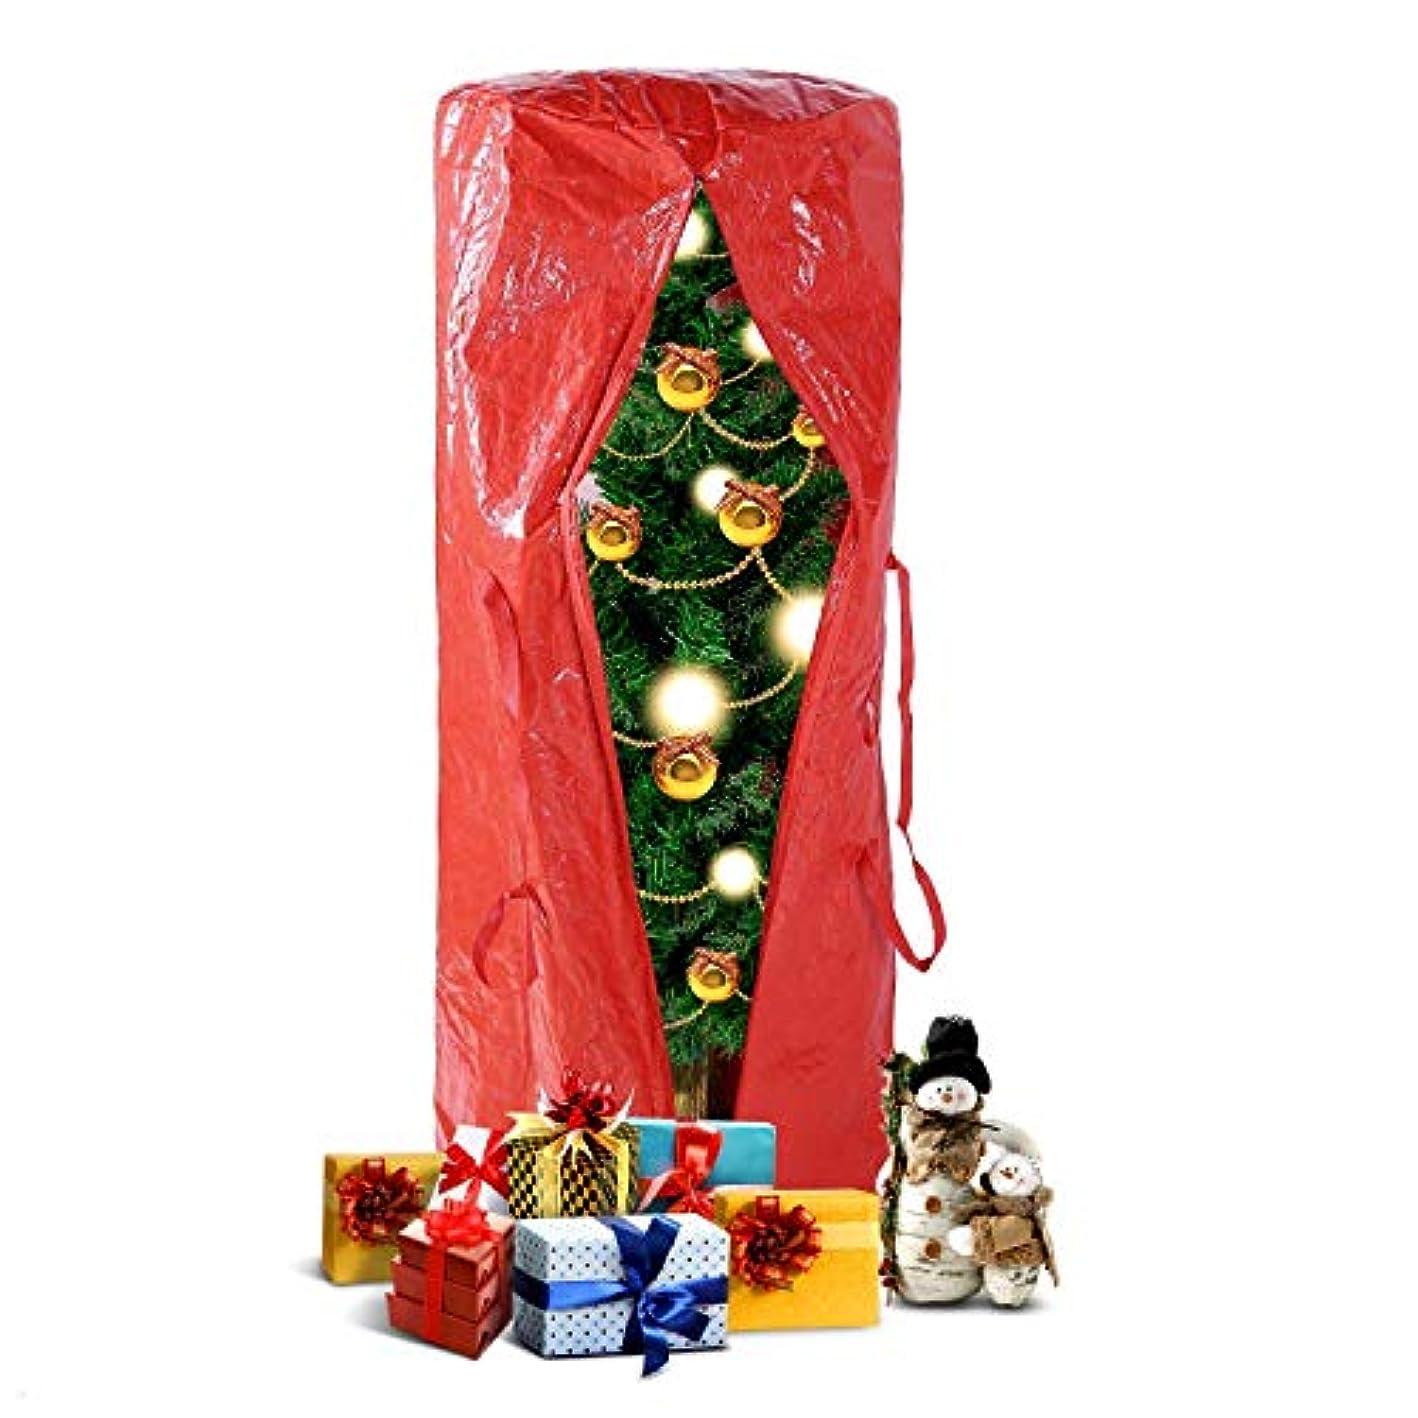 Ohuhu Christmas Tree Storage Bag 5.2' x 2.1' x 2.1' for 5 Foot Tree or 9 Foot Disassembled Christmas Tree, Multipurpose Storage Bag, Red